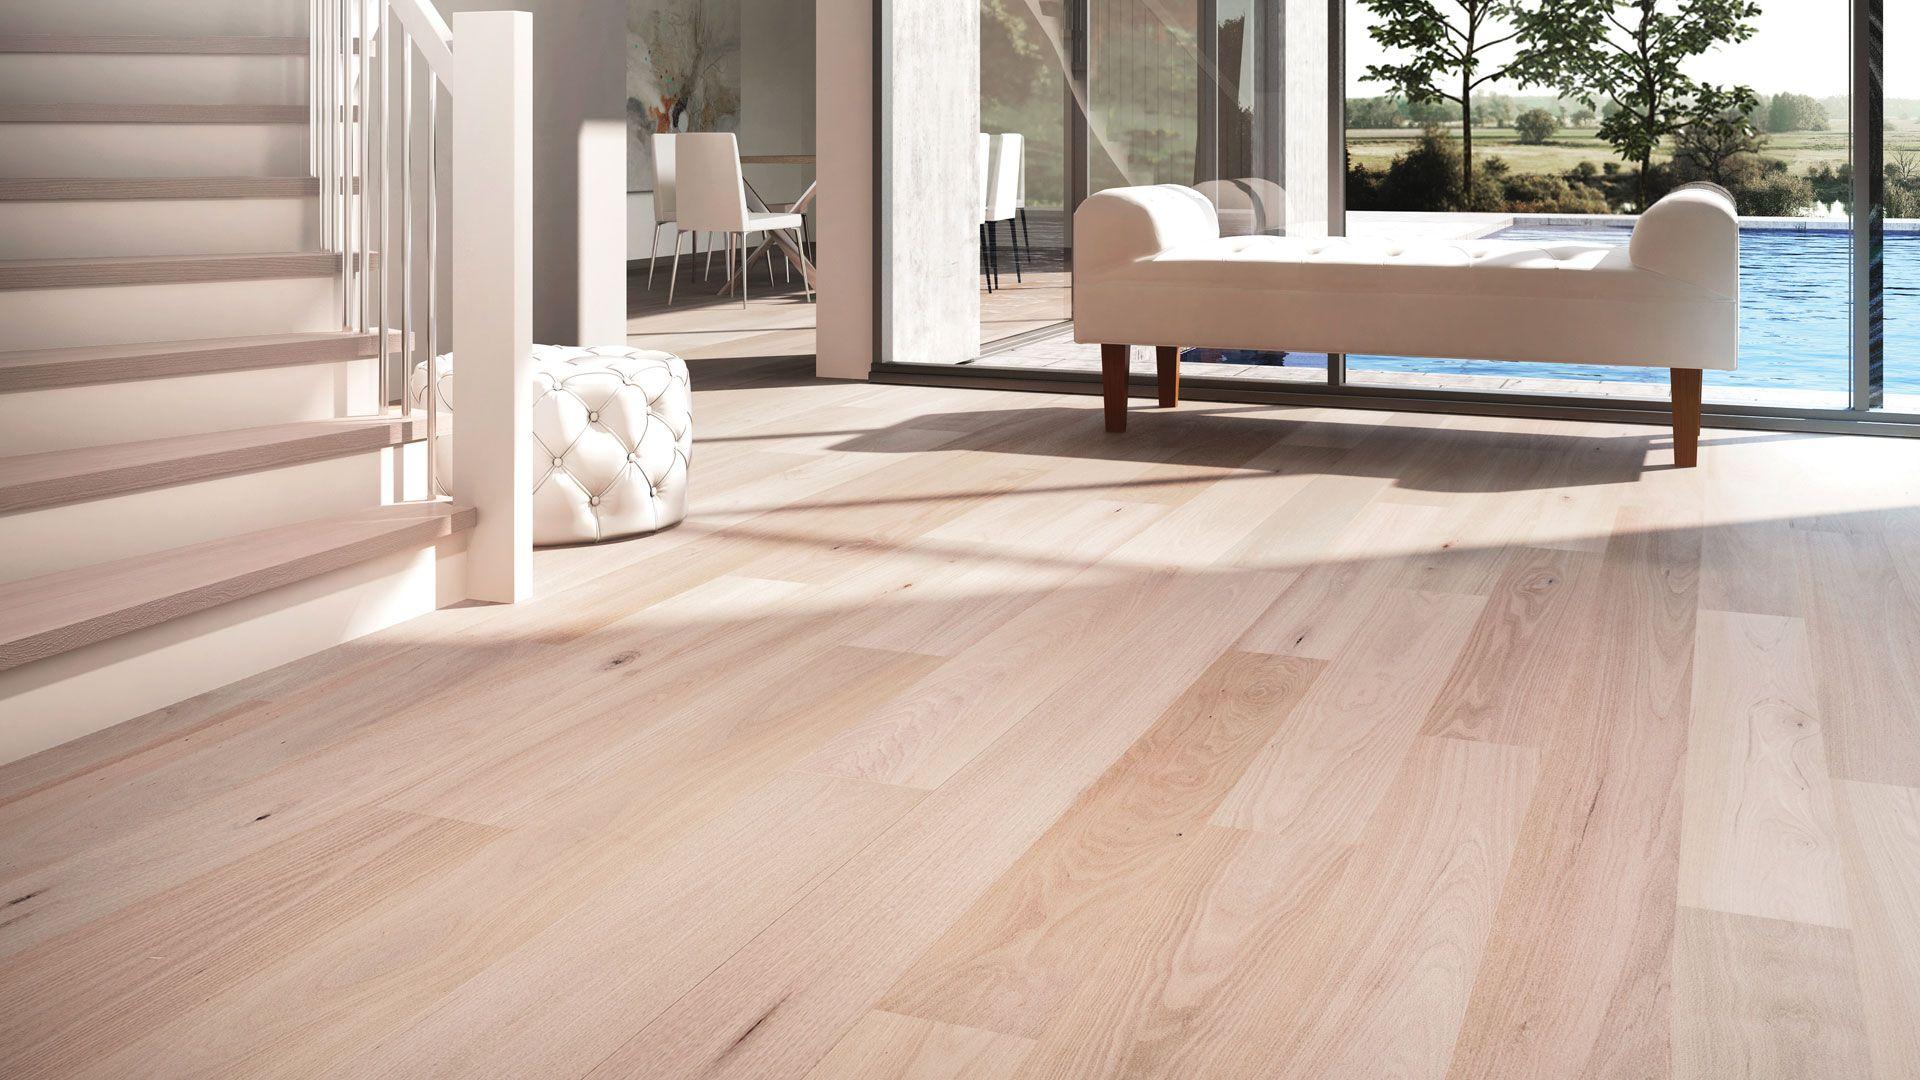 Latest 3 Hardwood Flooring Trends | Hall, Entry hall and Light ...